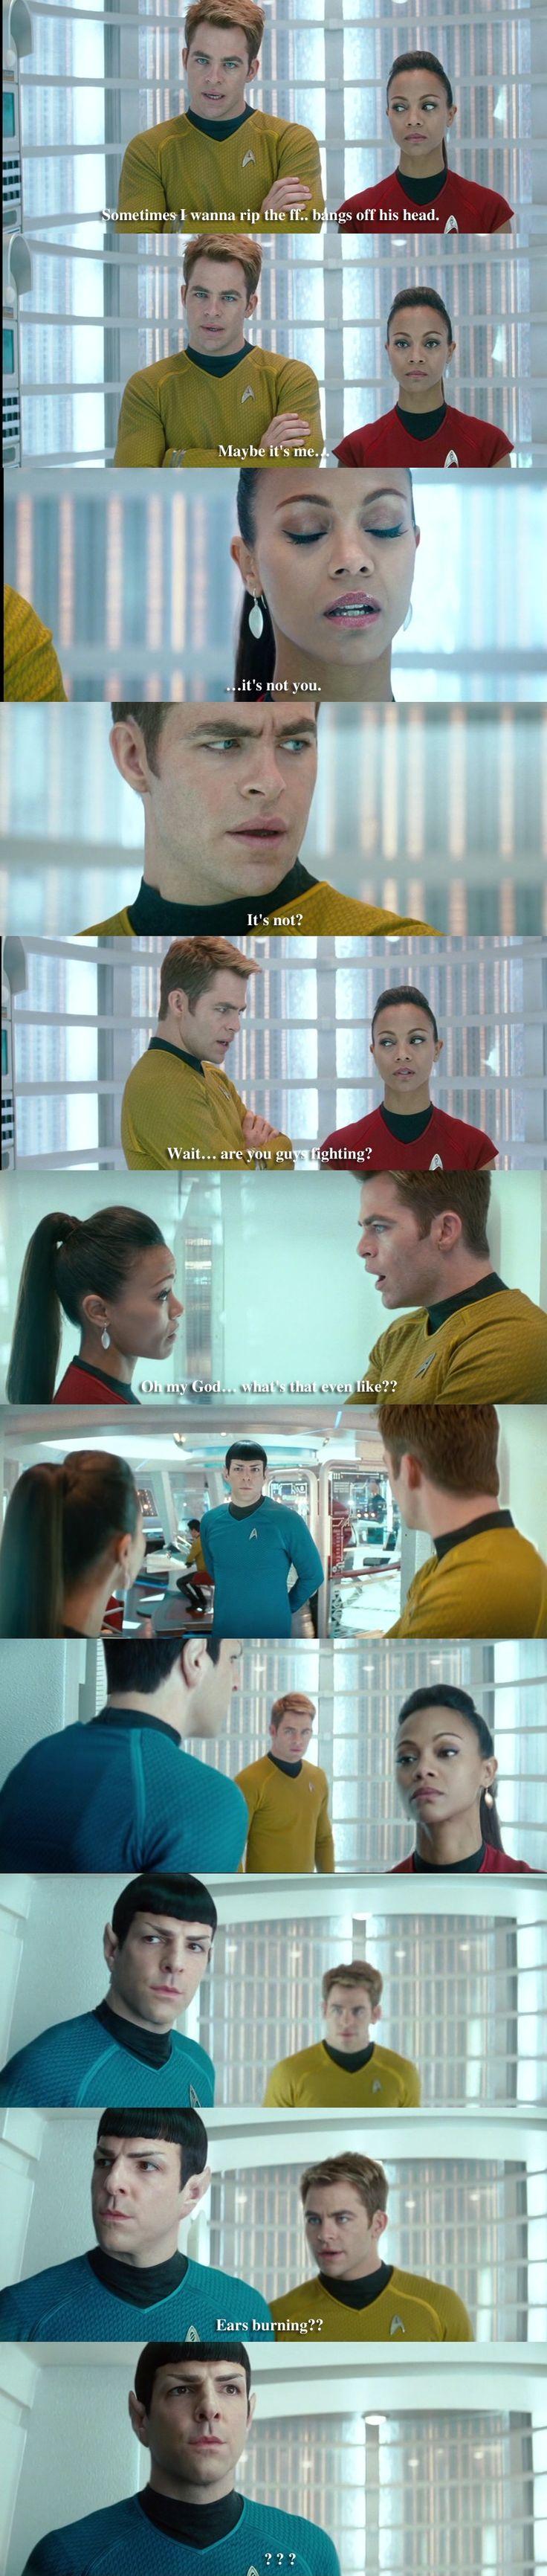 "Star Trek: Into Darkness. ""Ears burning, poor Spock?"" (2013, J.J. Abrams; starring Chris Pine, Zoe Saldana, Zachary Quinto)"